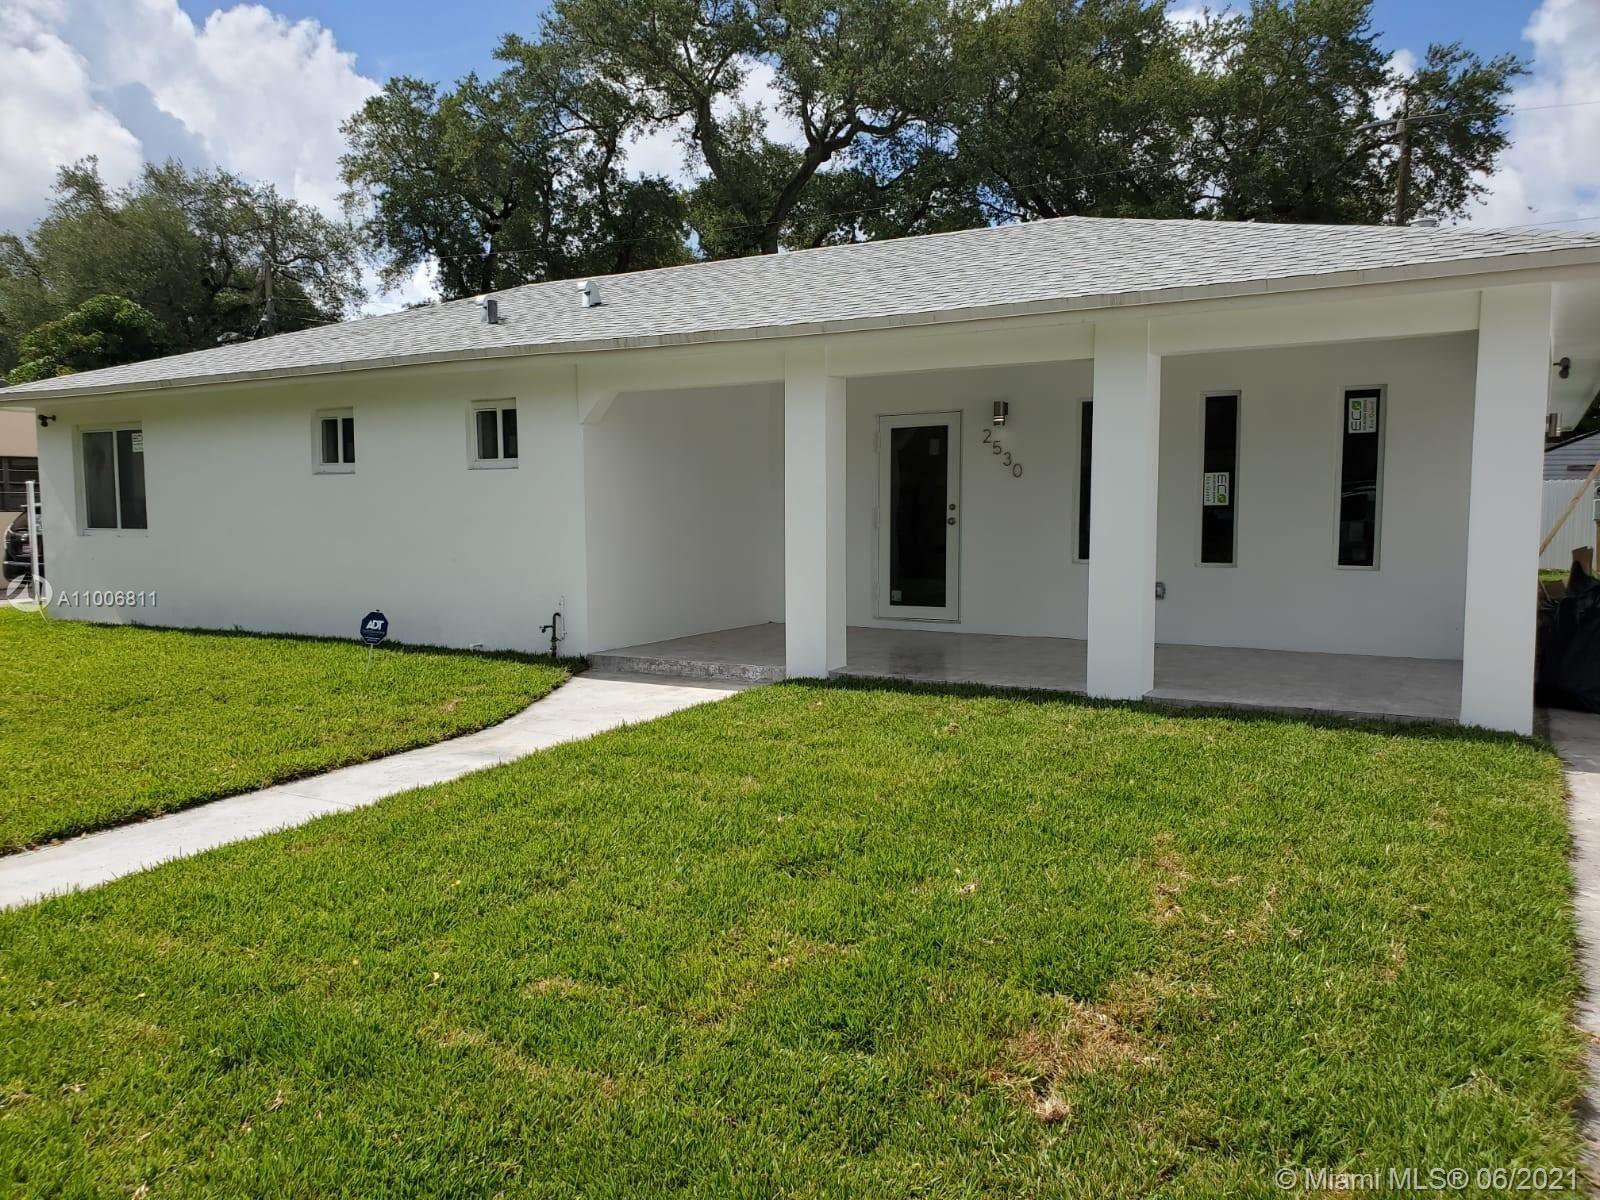 2530 NW 170th Ter, Miami Gardens, FL 33056 - #: A11006811